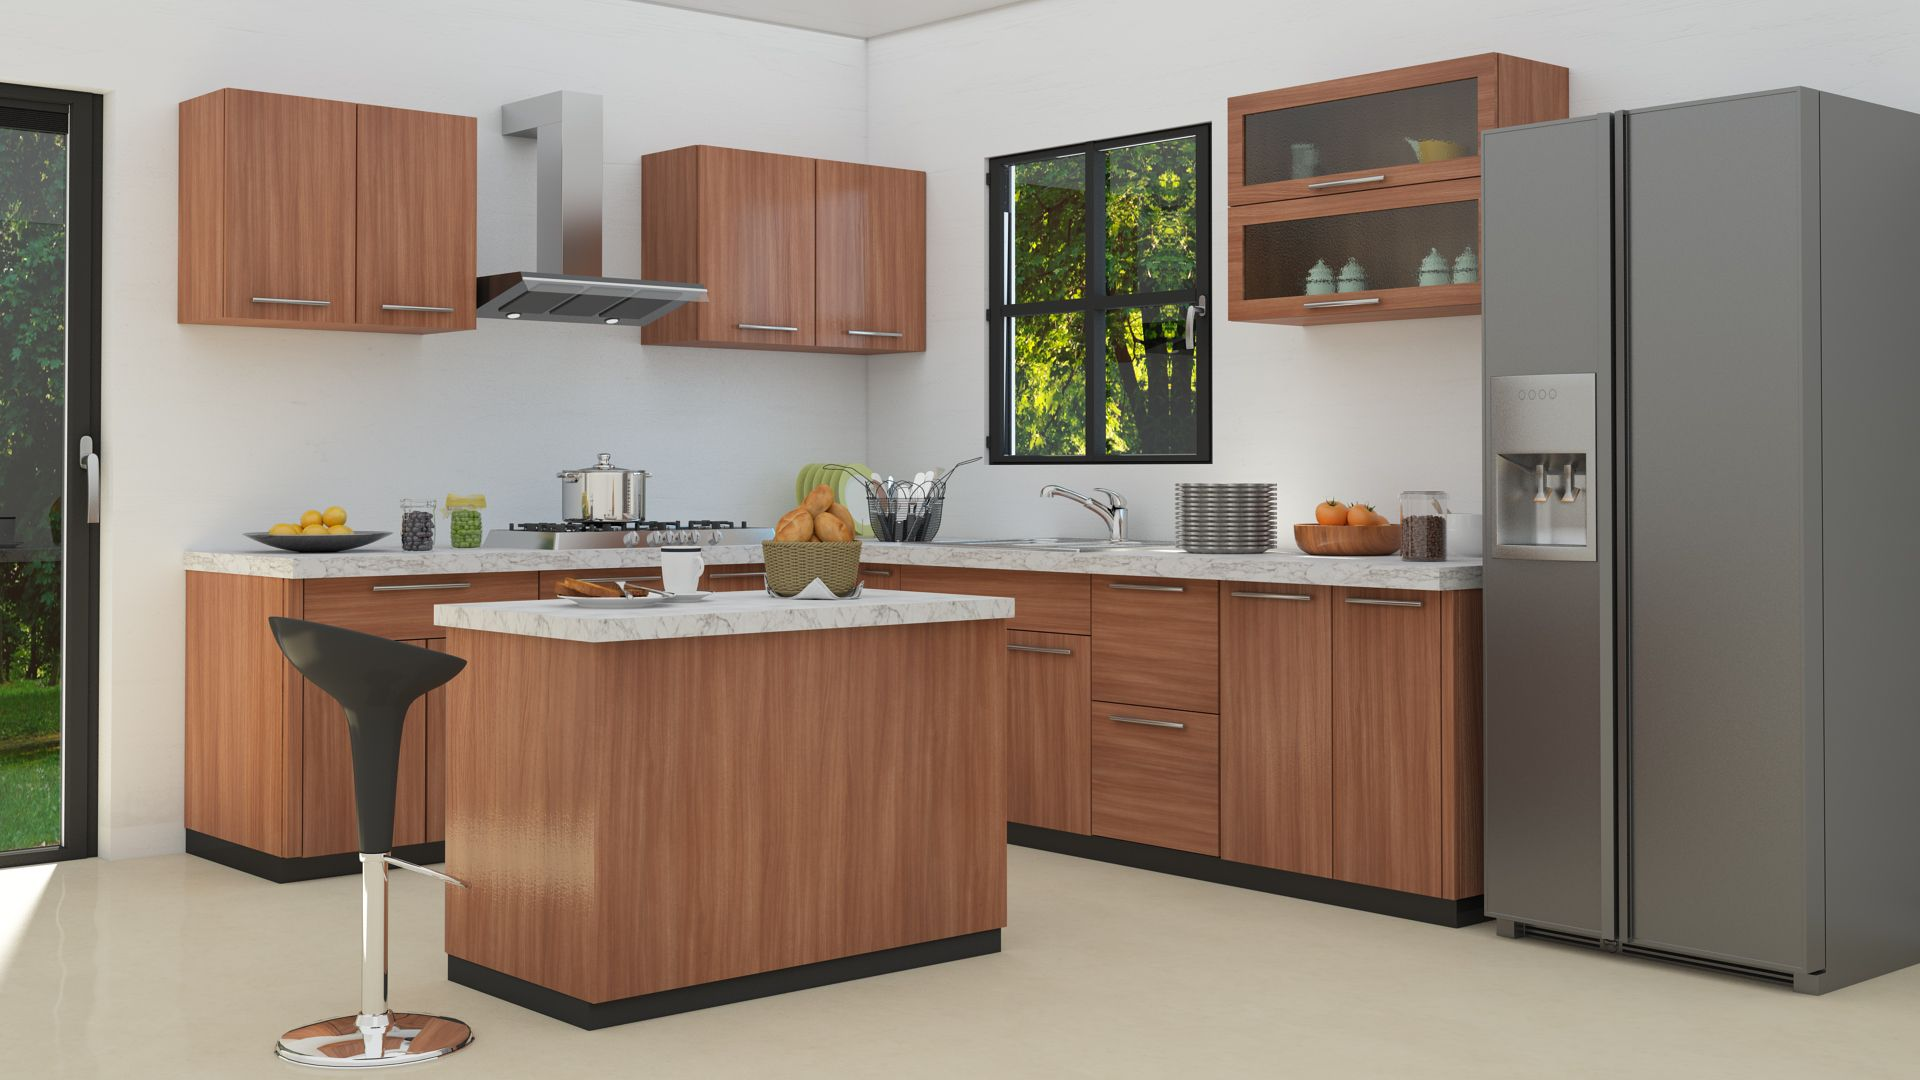 Http Www Customfurnish Com Modular Kitchens Kitchen Cabinet